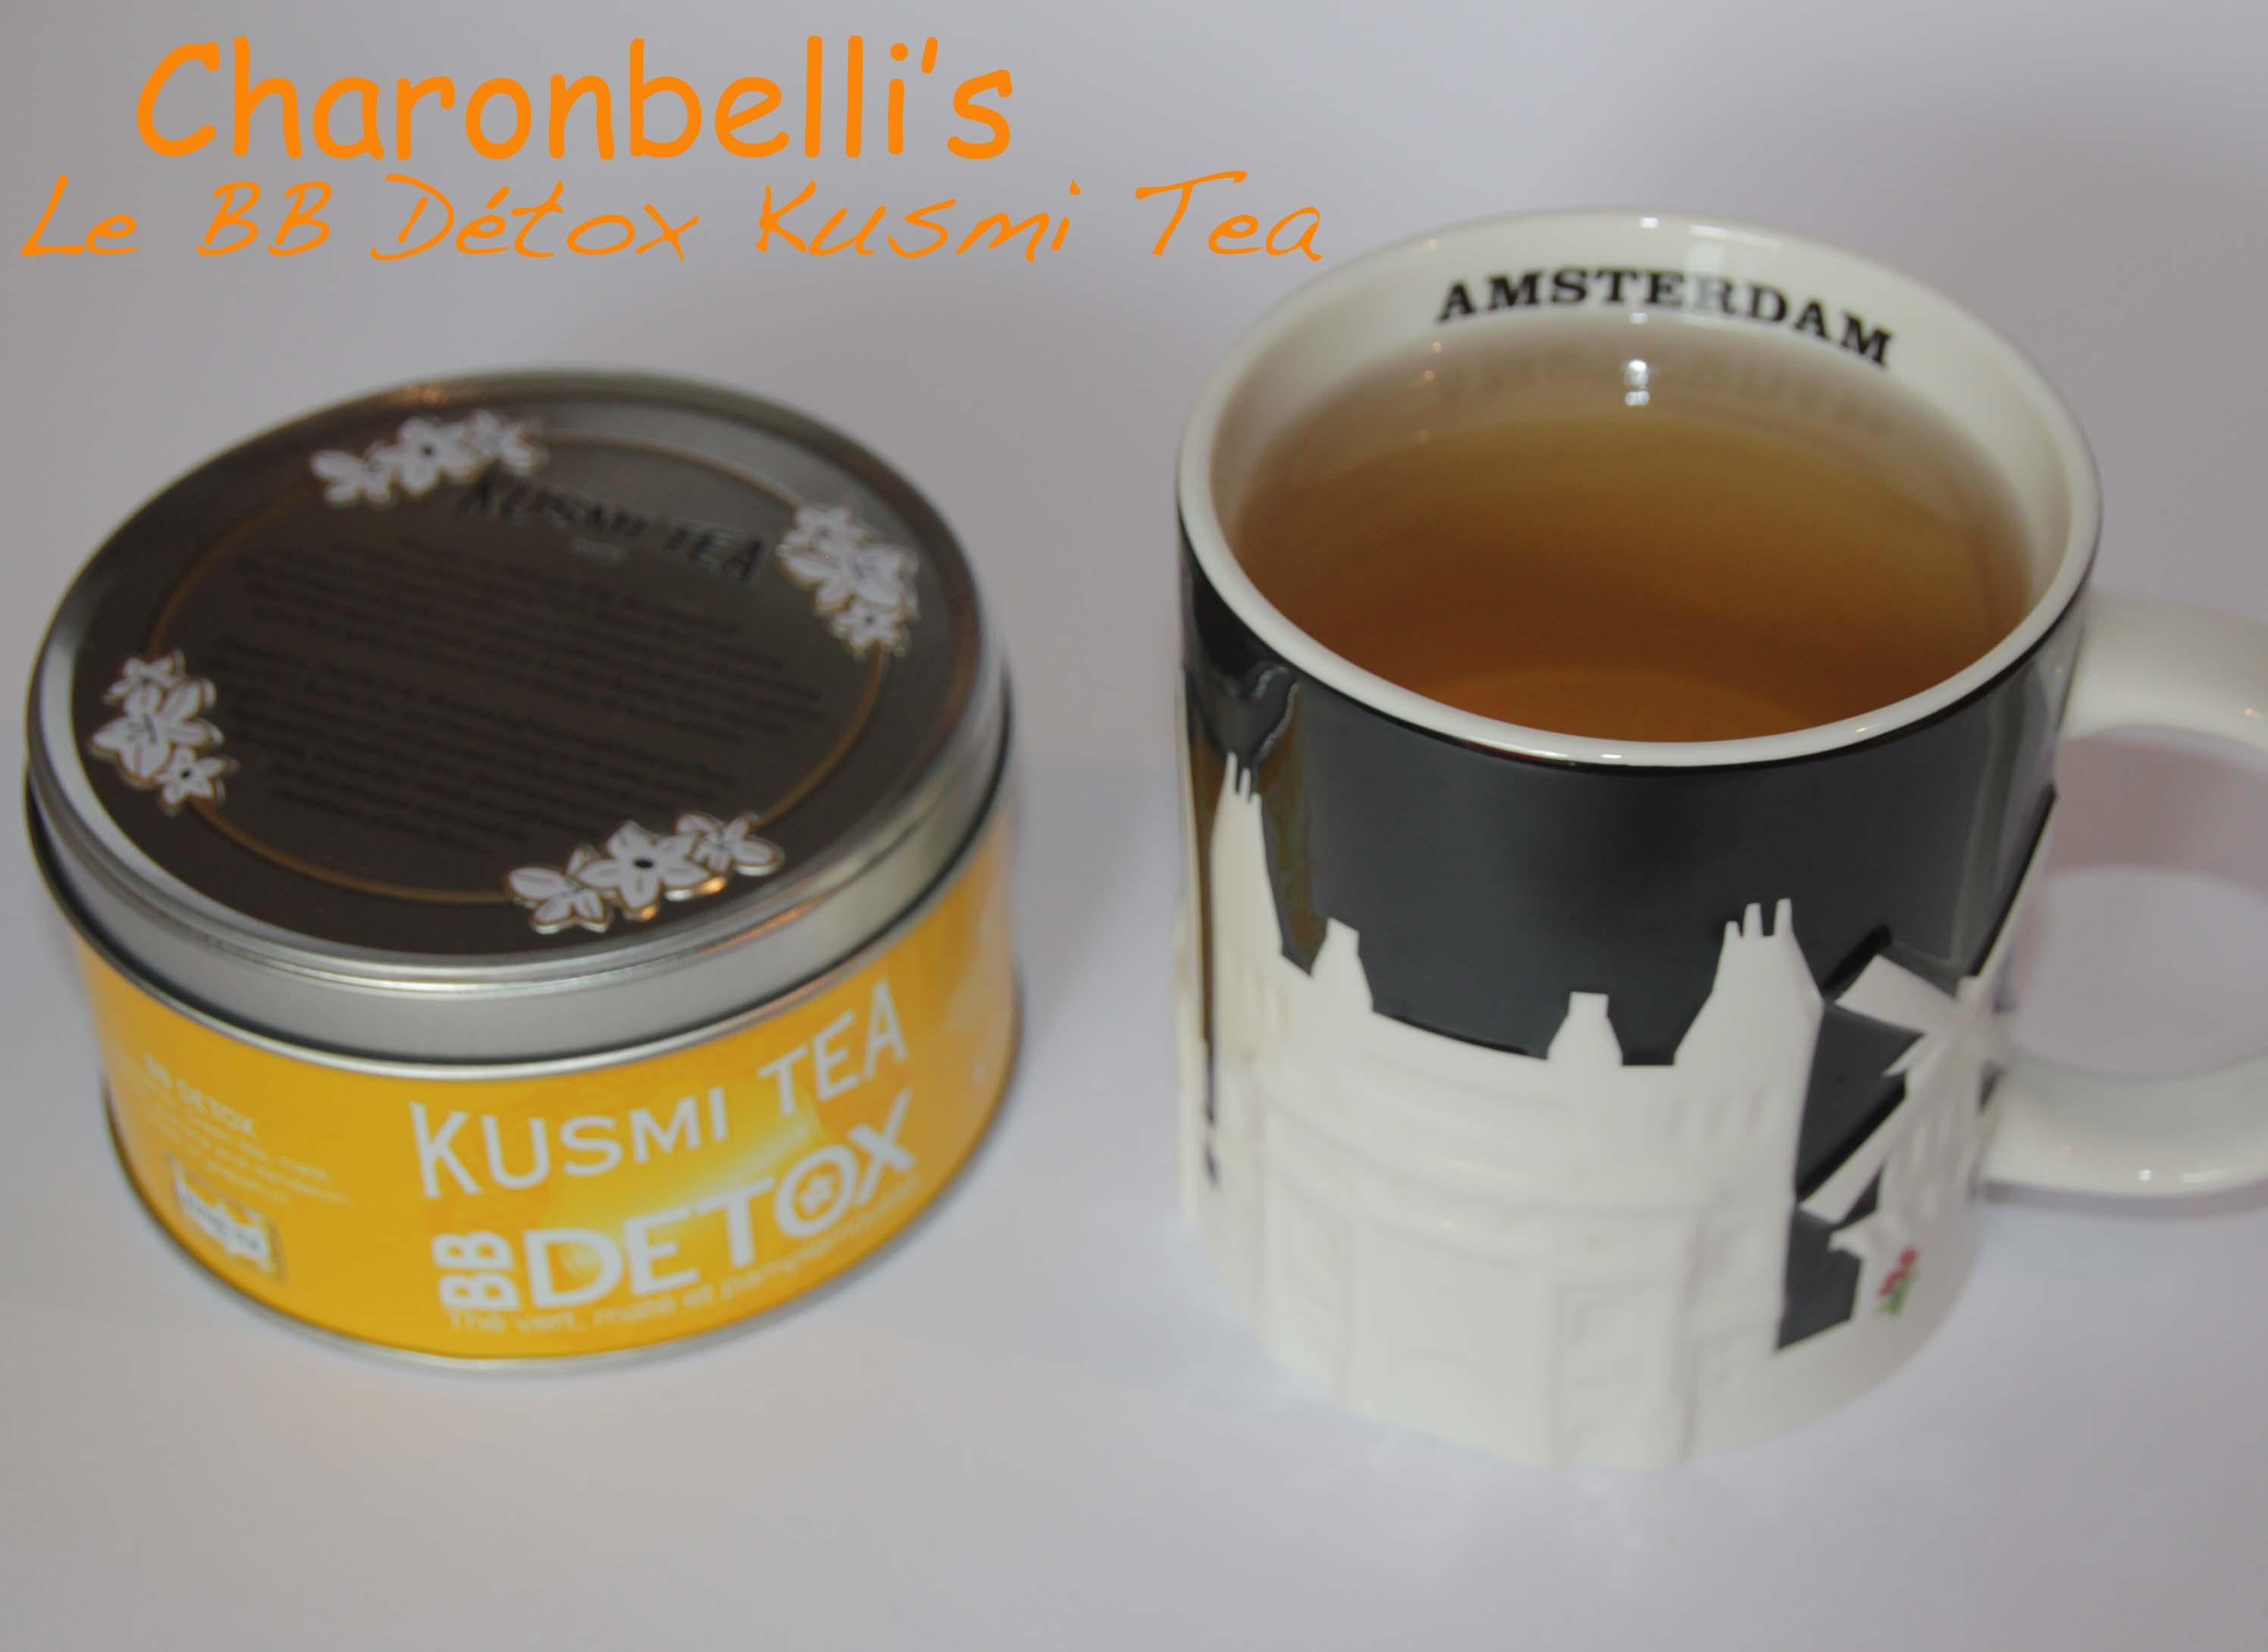 BB Détox Kusmi Tea (2) - Charonbelli's blog de cuisine